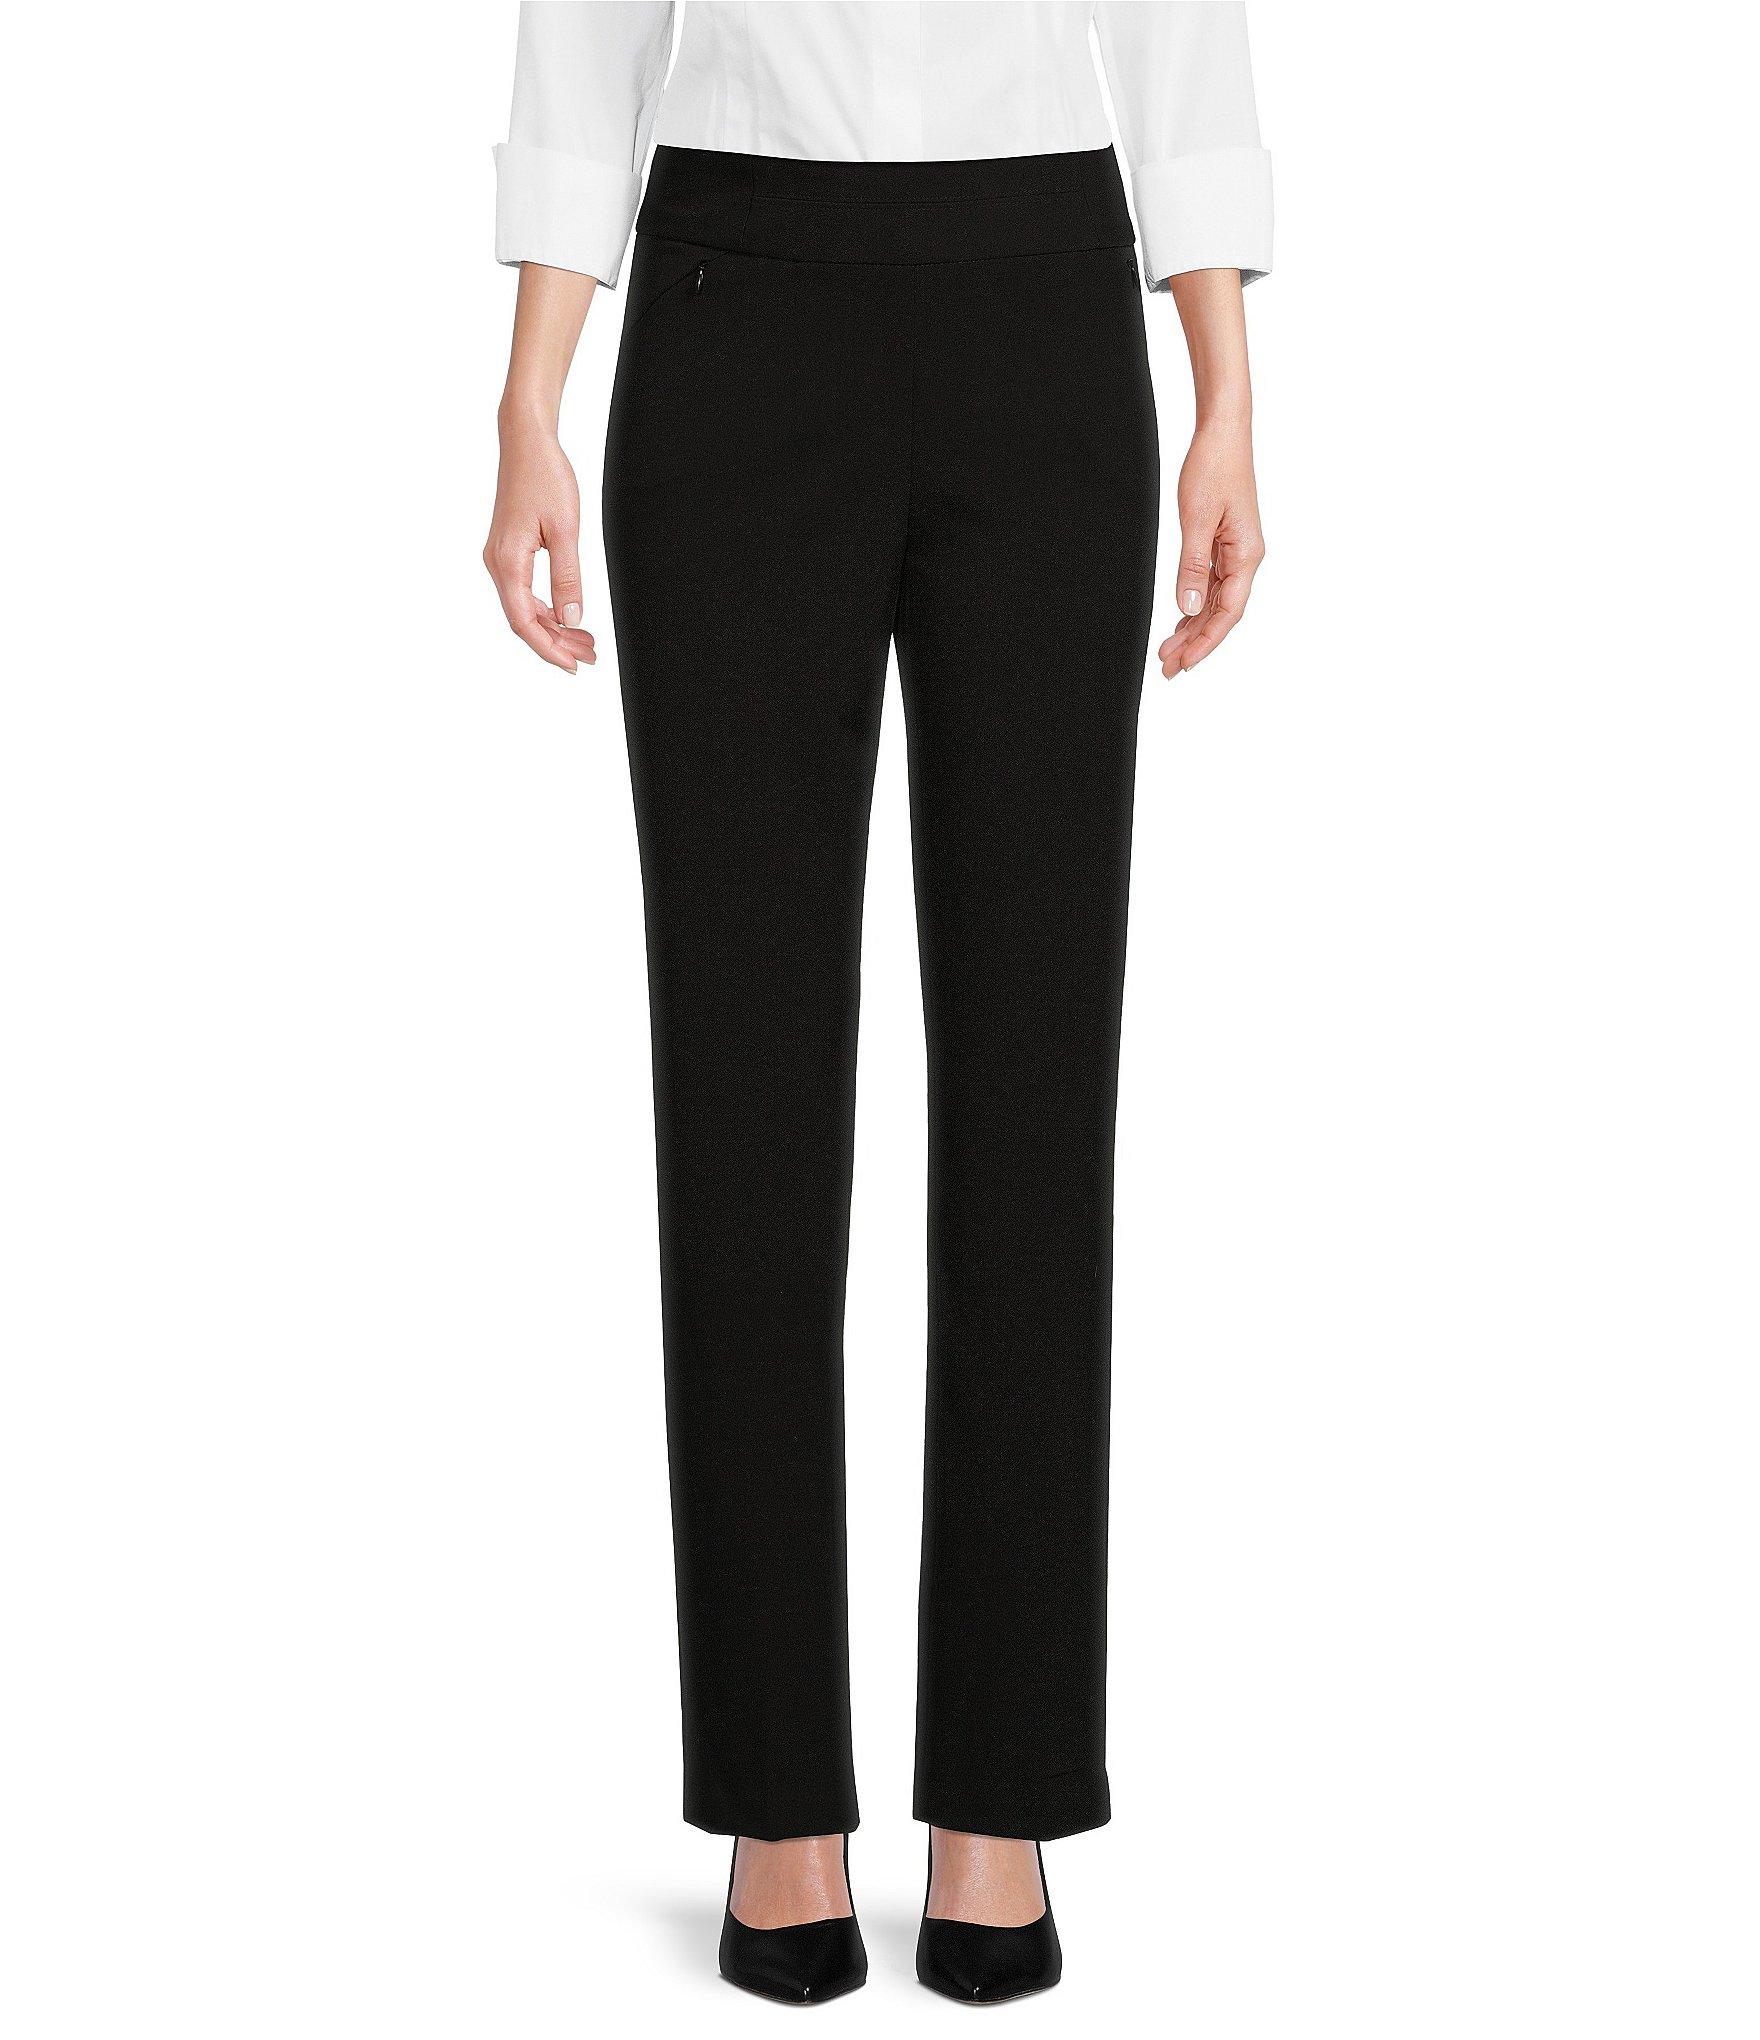 55c48a001dcbfb Women's Casual & Dress Pants | Dillard's